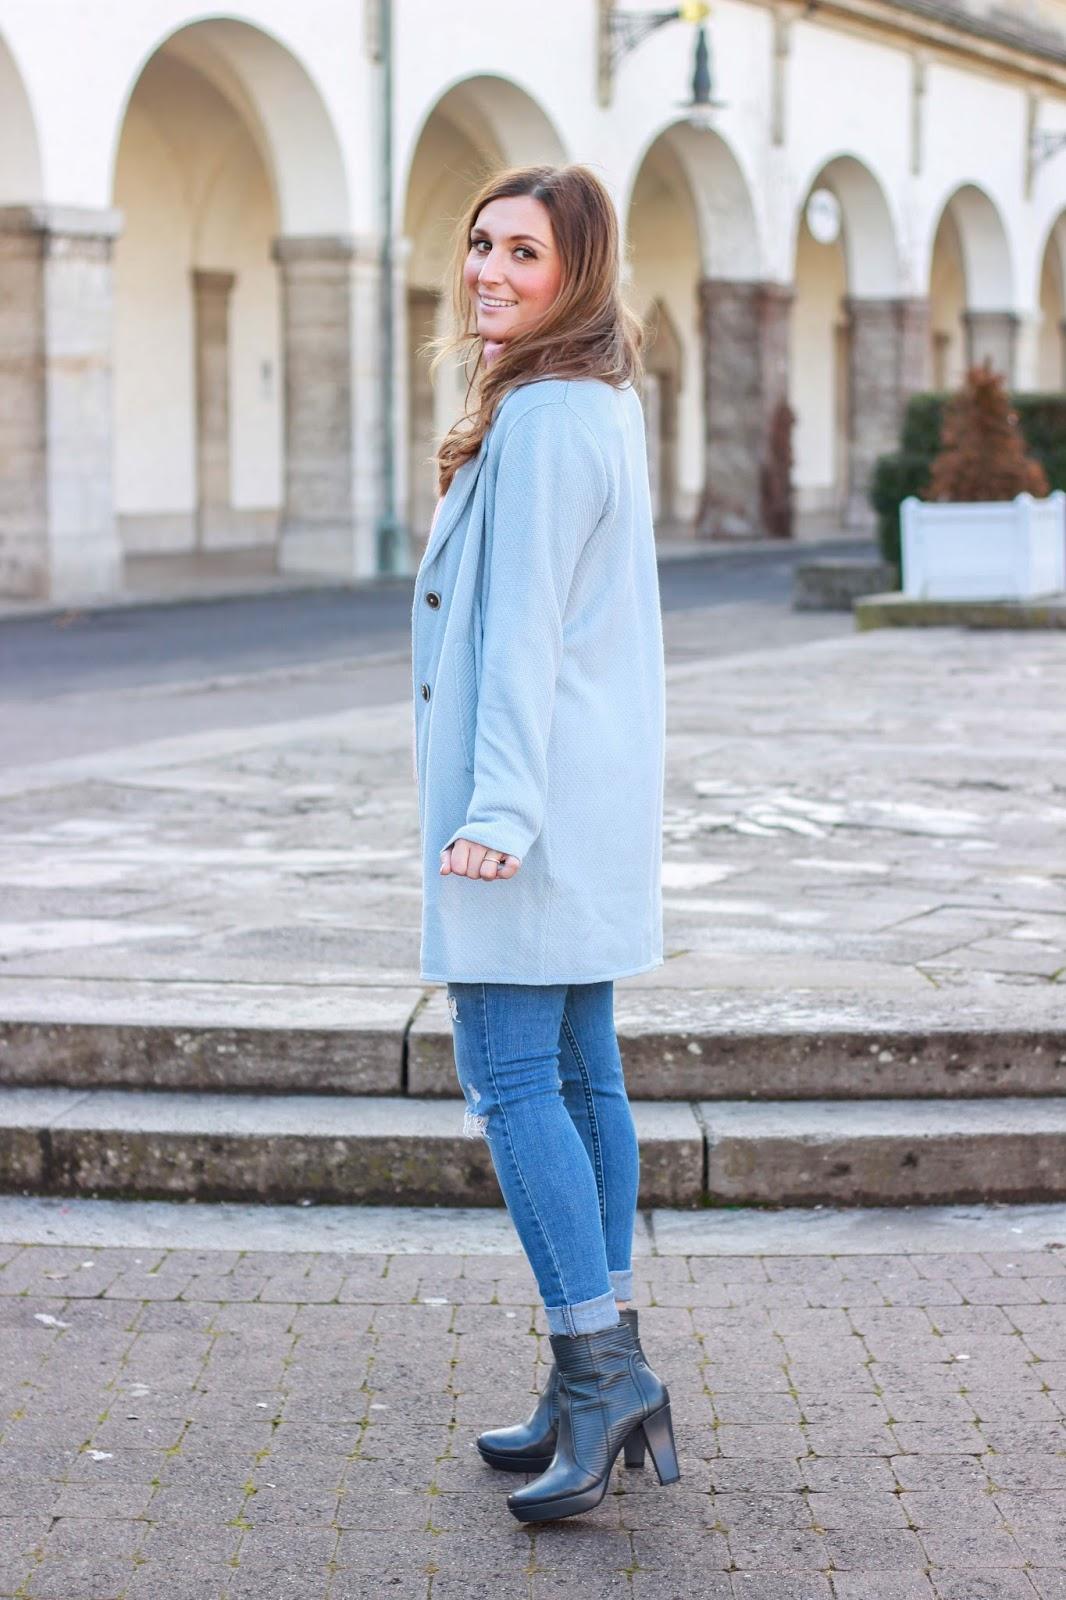 Pastell Blaue Jacke Von Taifun Fashion